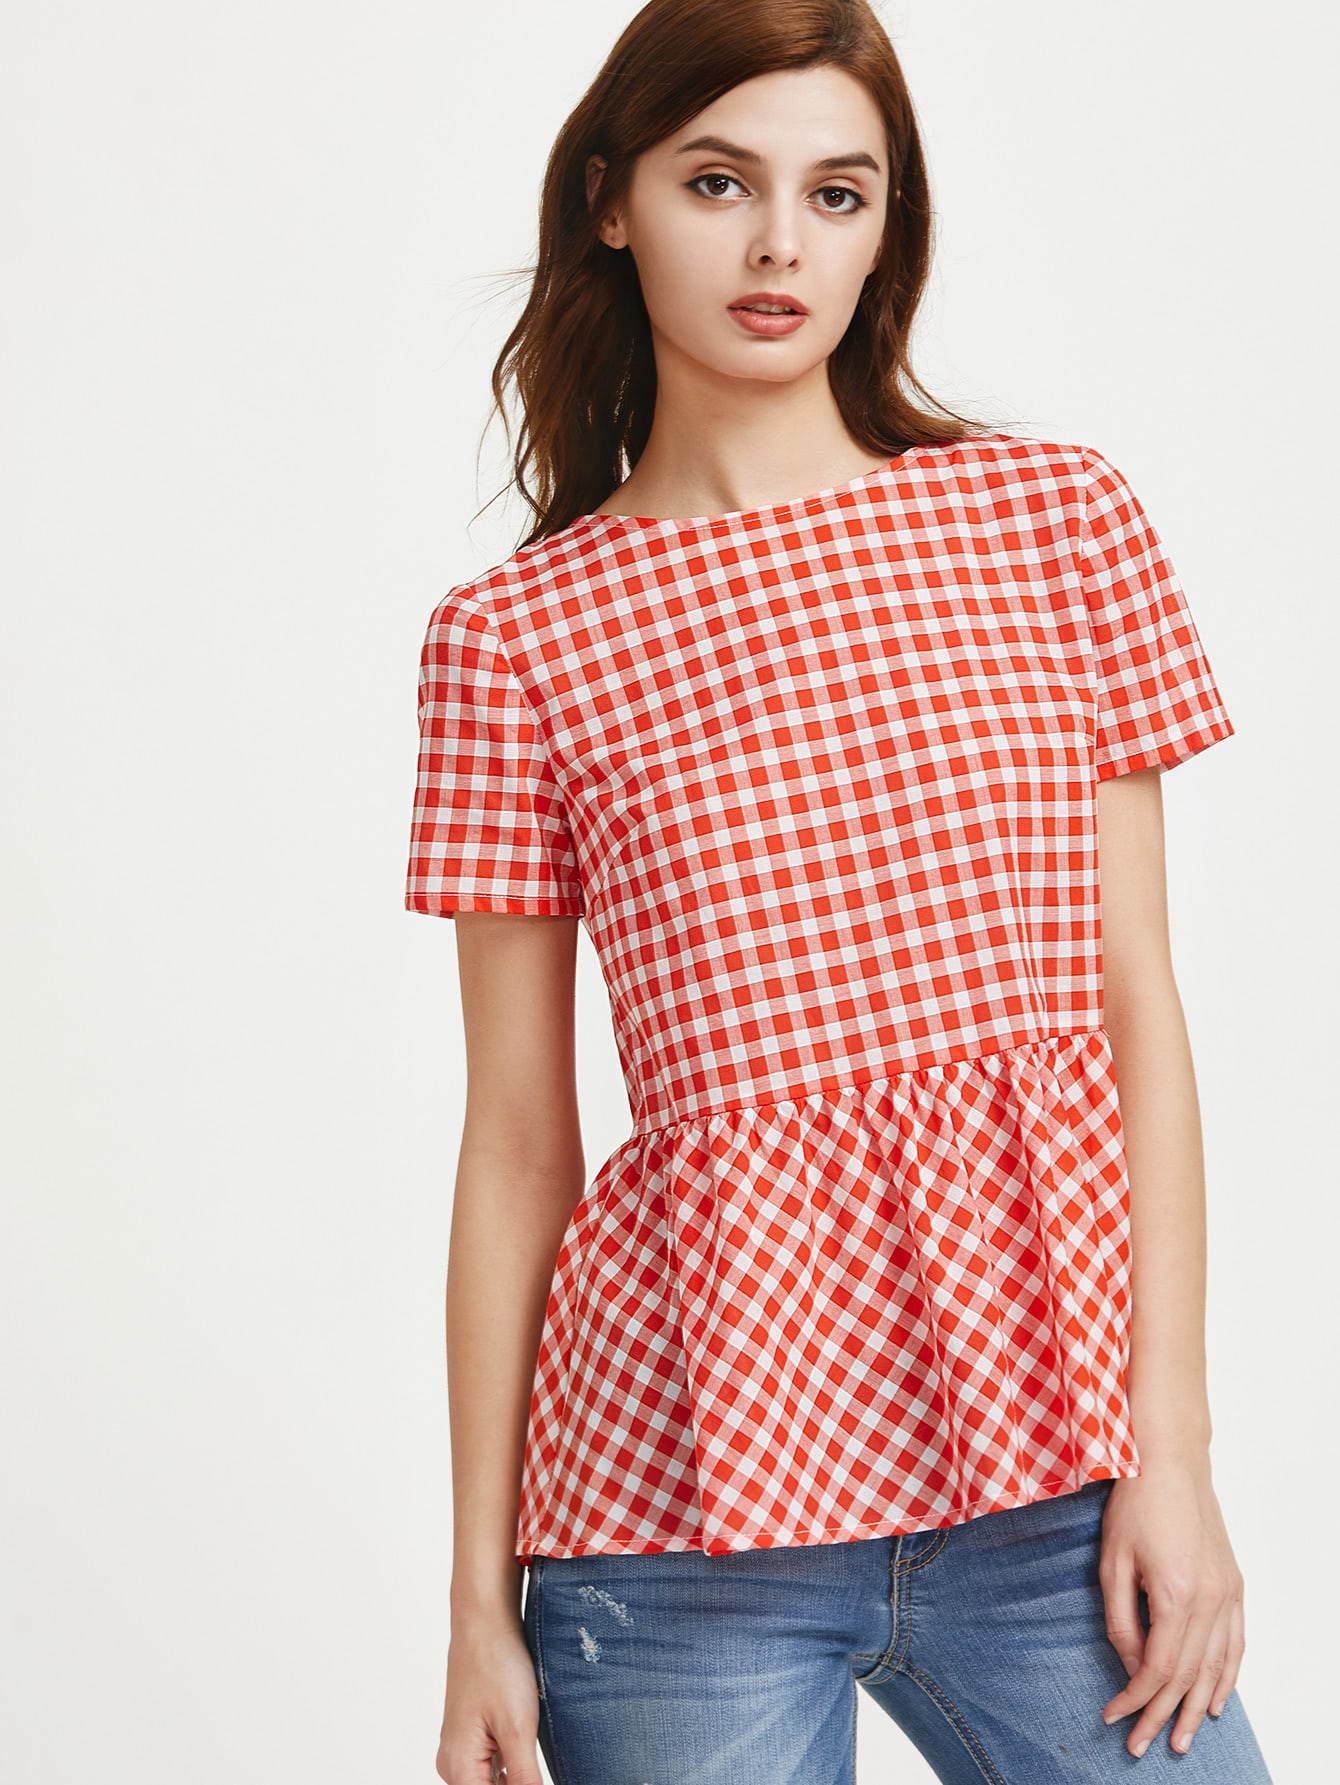 blouse170327703_2